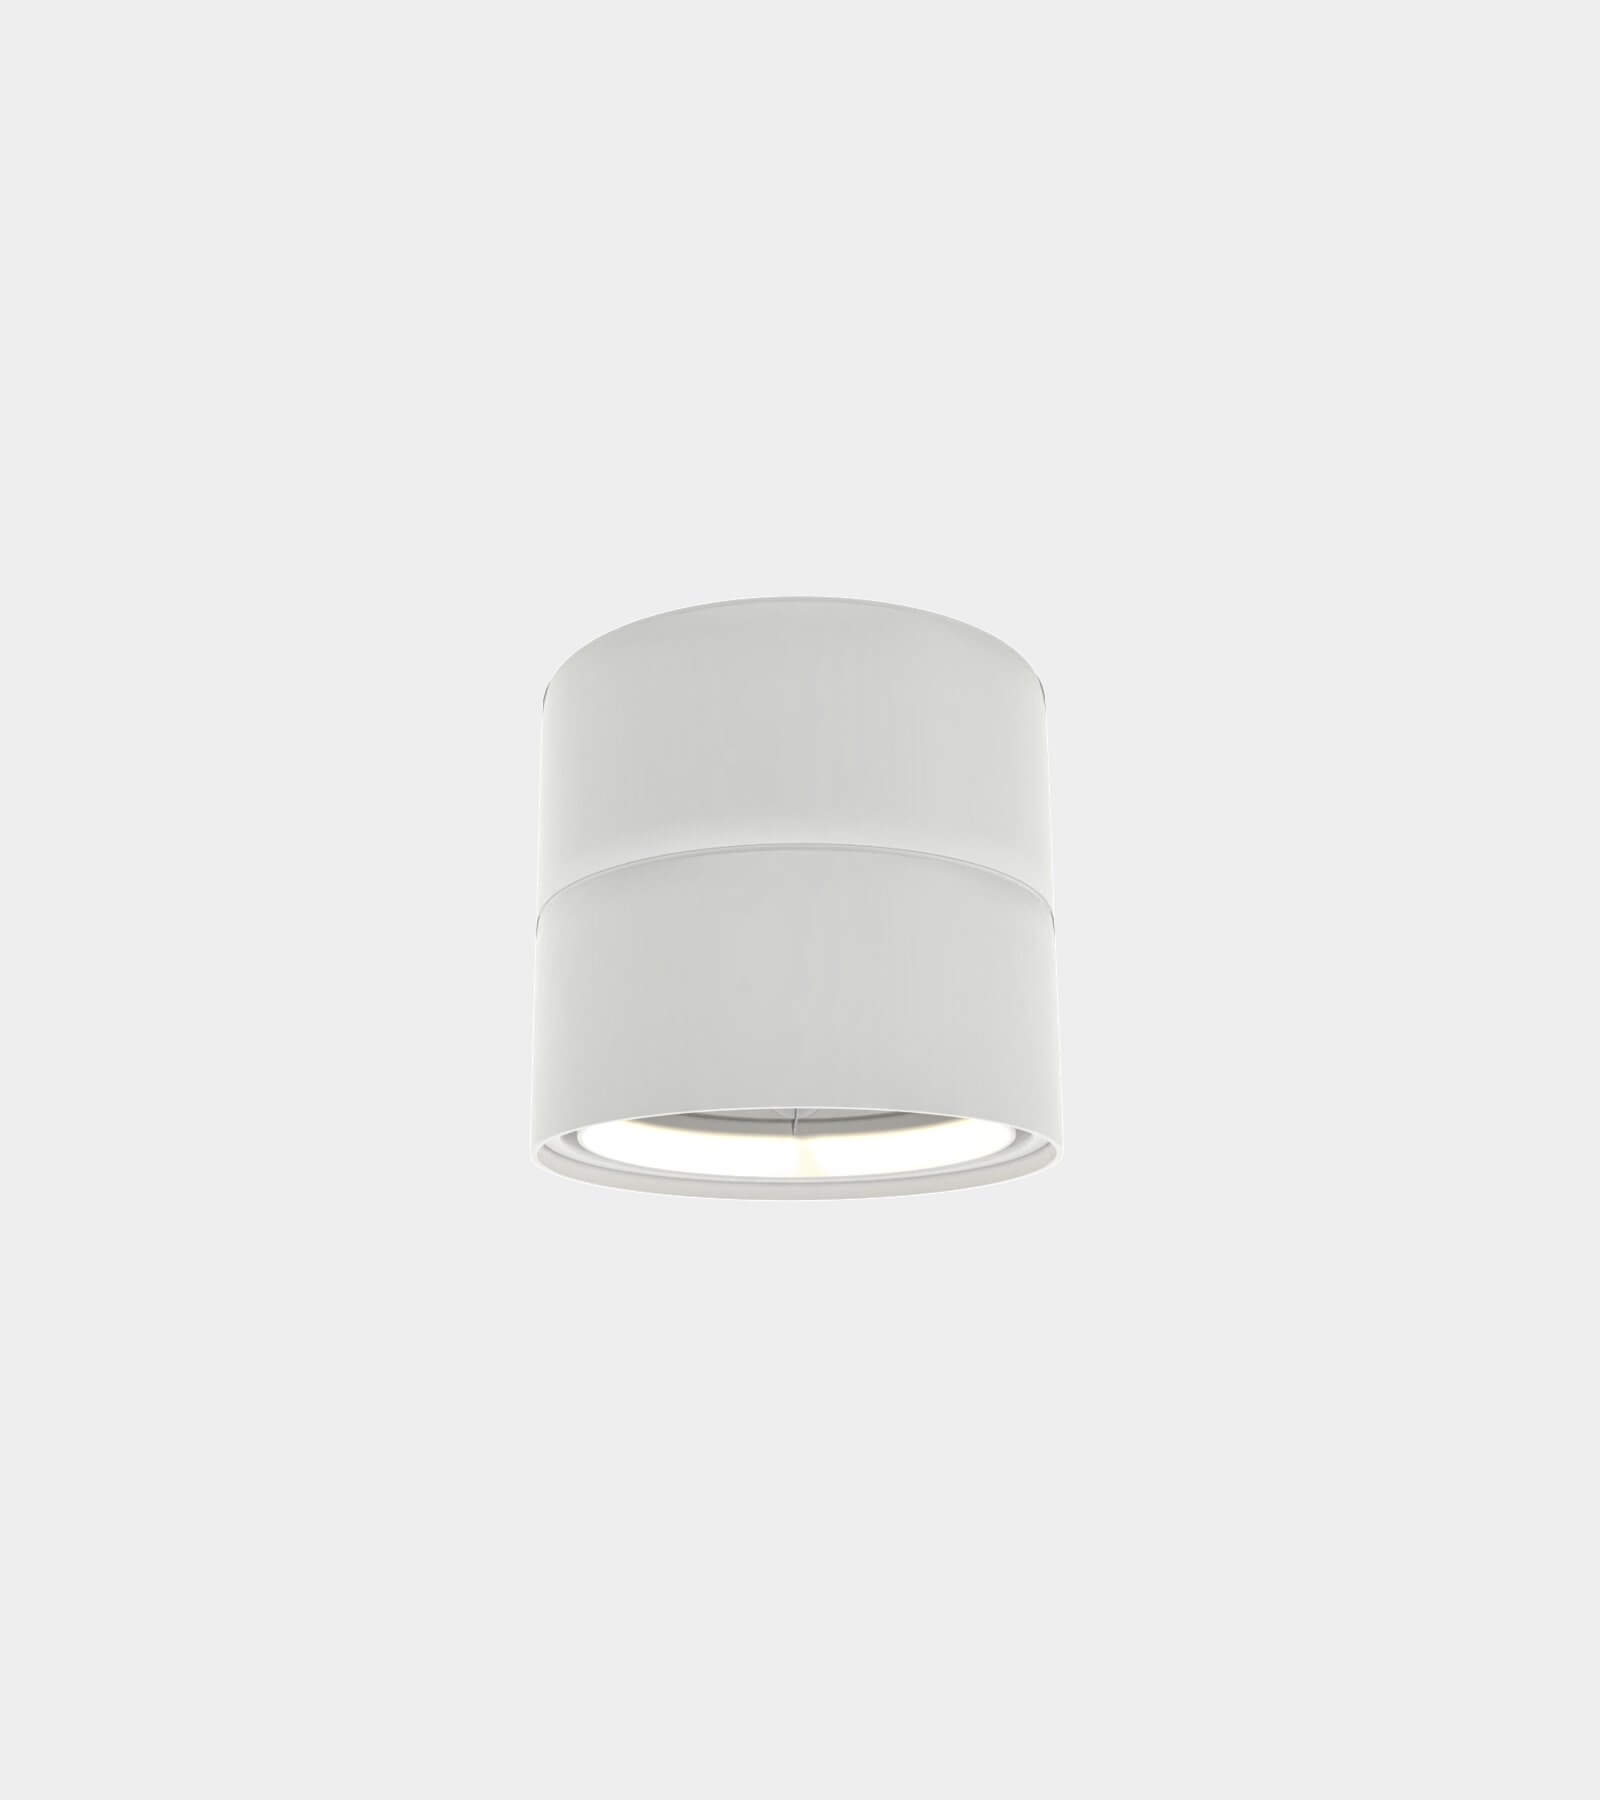 Adjustable ceiling spot light 1 - 3D Model